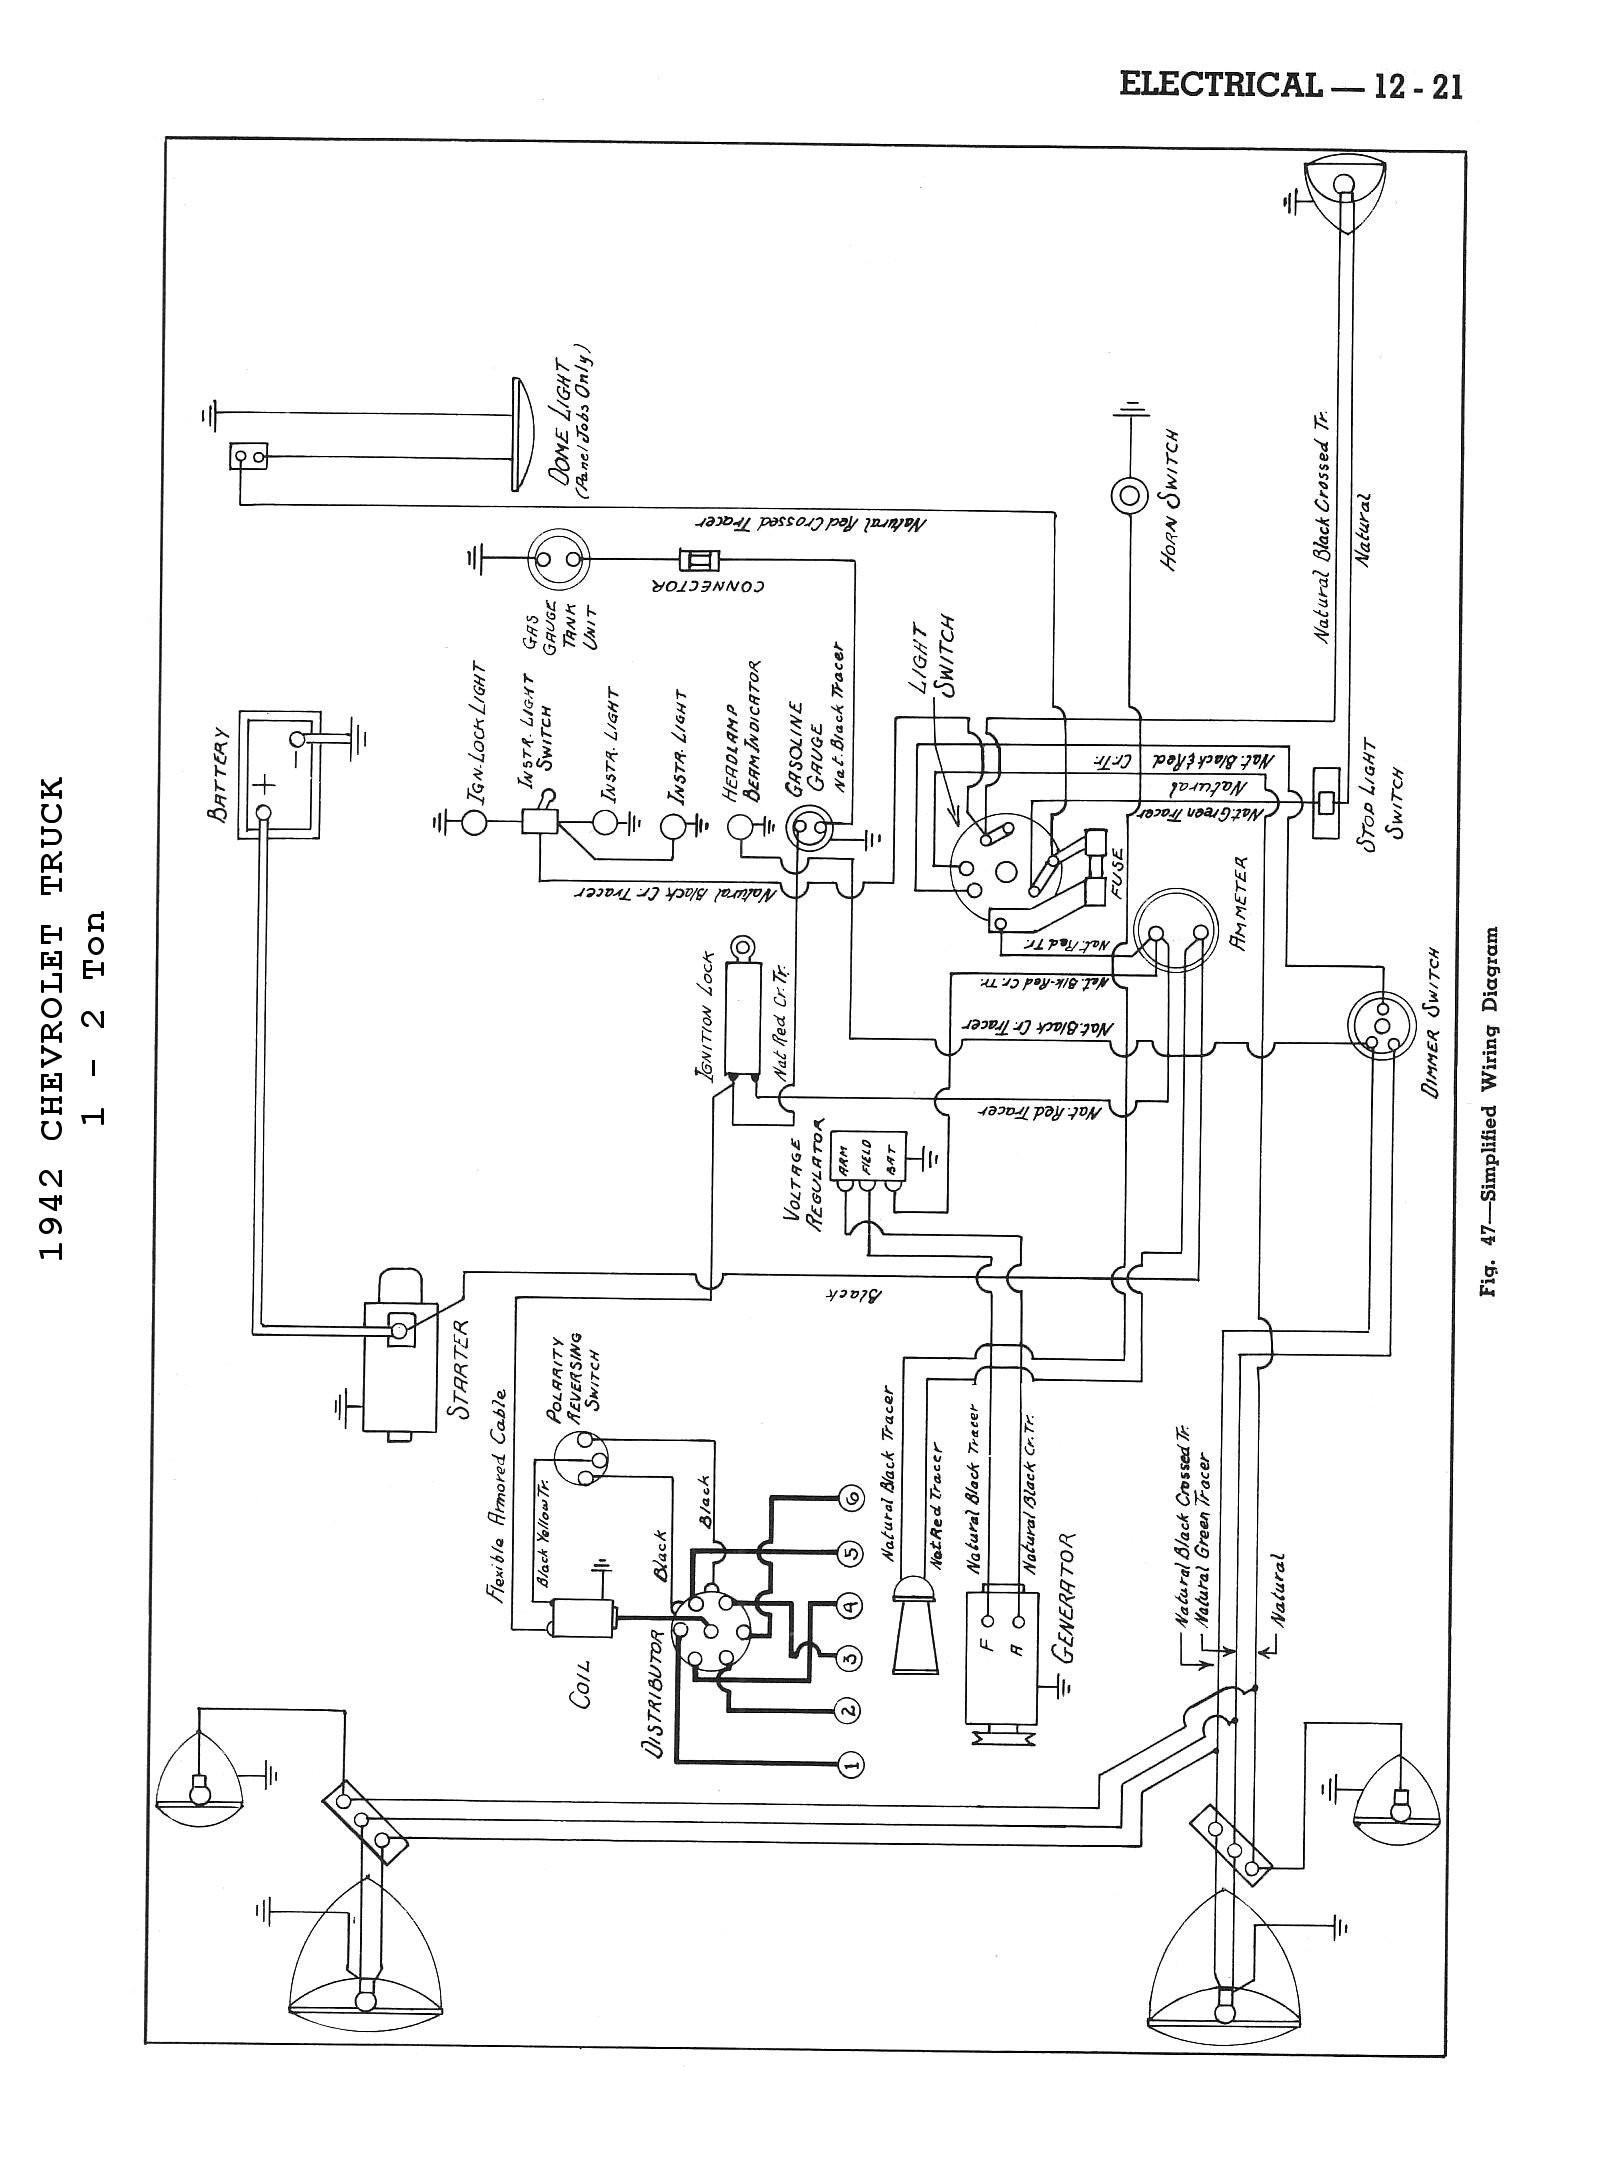 1942 Body Wiring Diagram · 1942 4x2 Truck Wiring